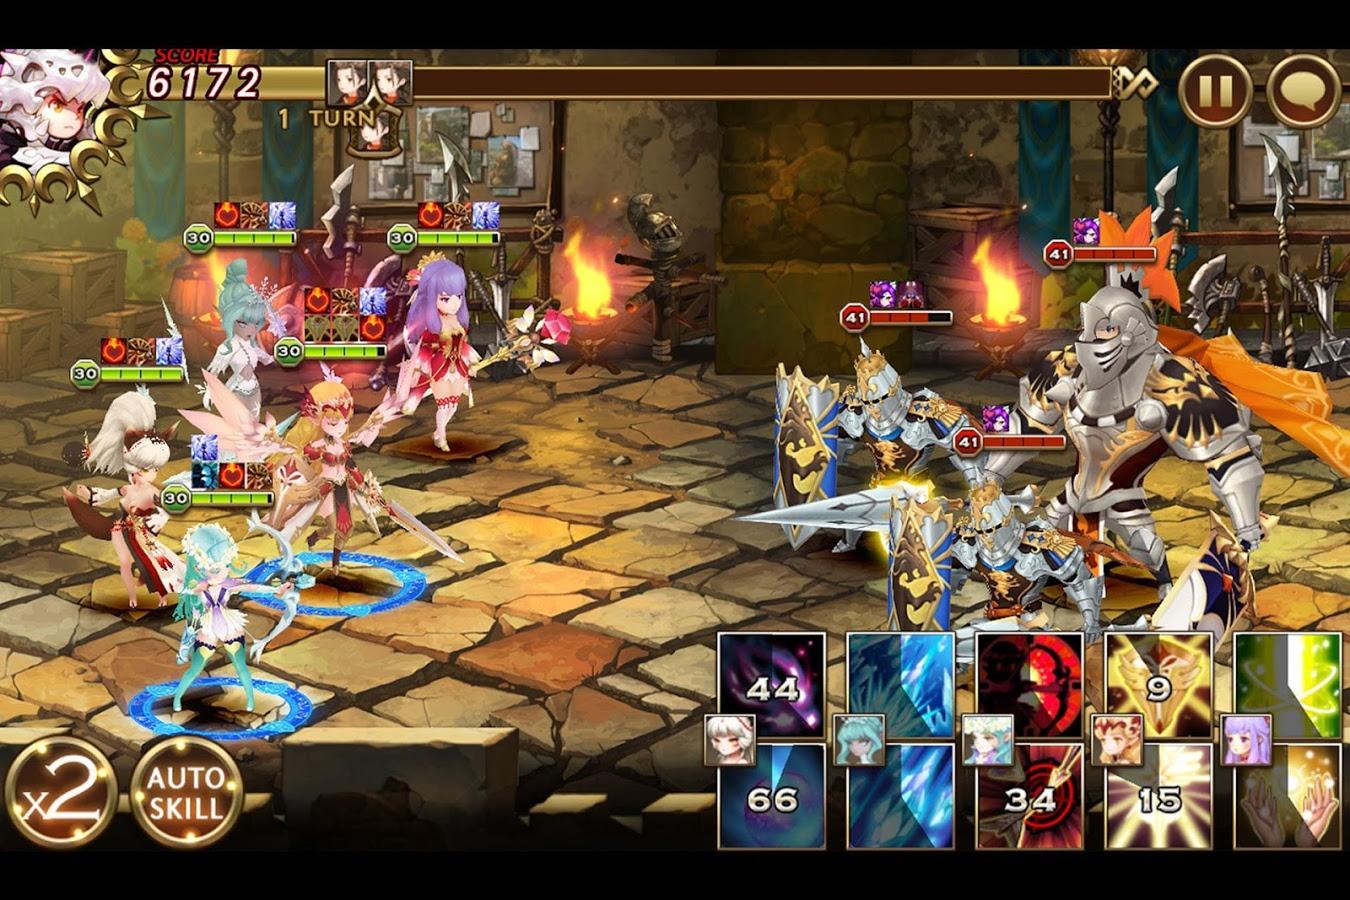 Seven Knights OnRPG